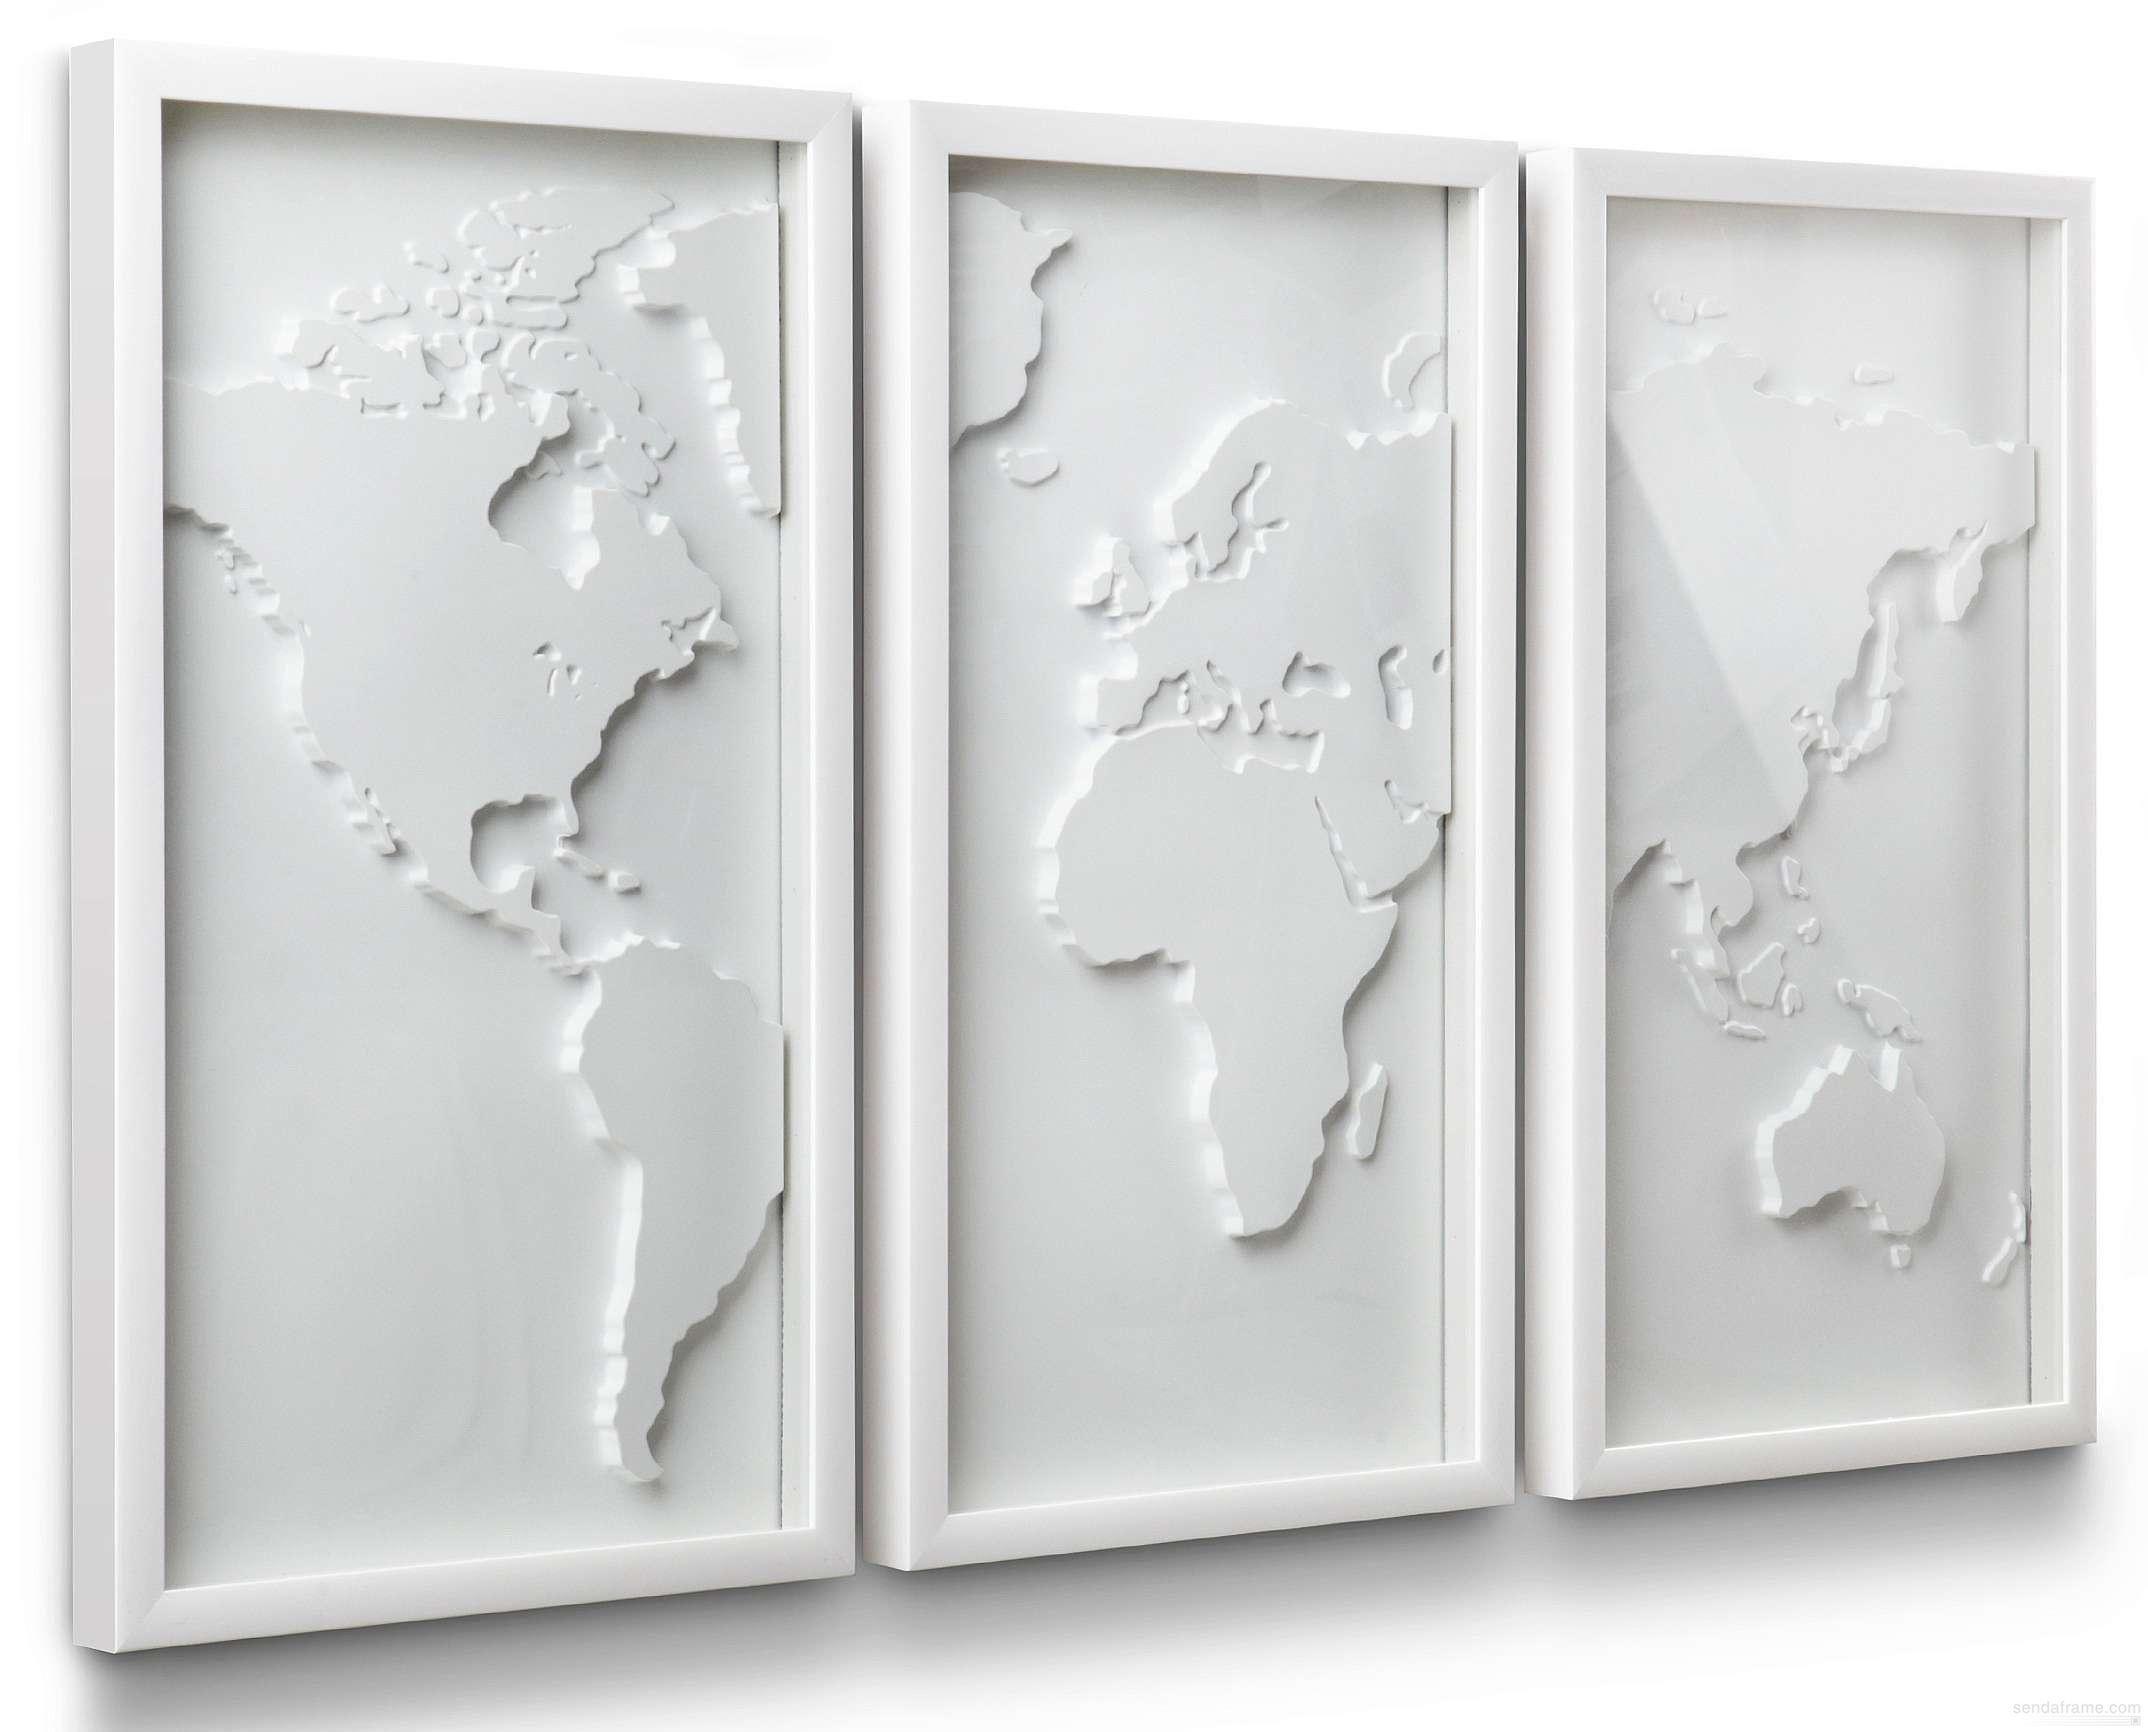 Umbra framed world map in relief covet pinterest umbra framed world map in relief gumiabroncs Choice Image